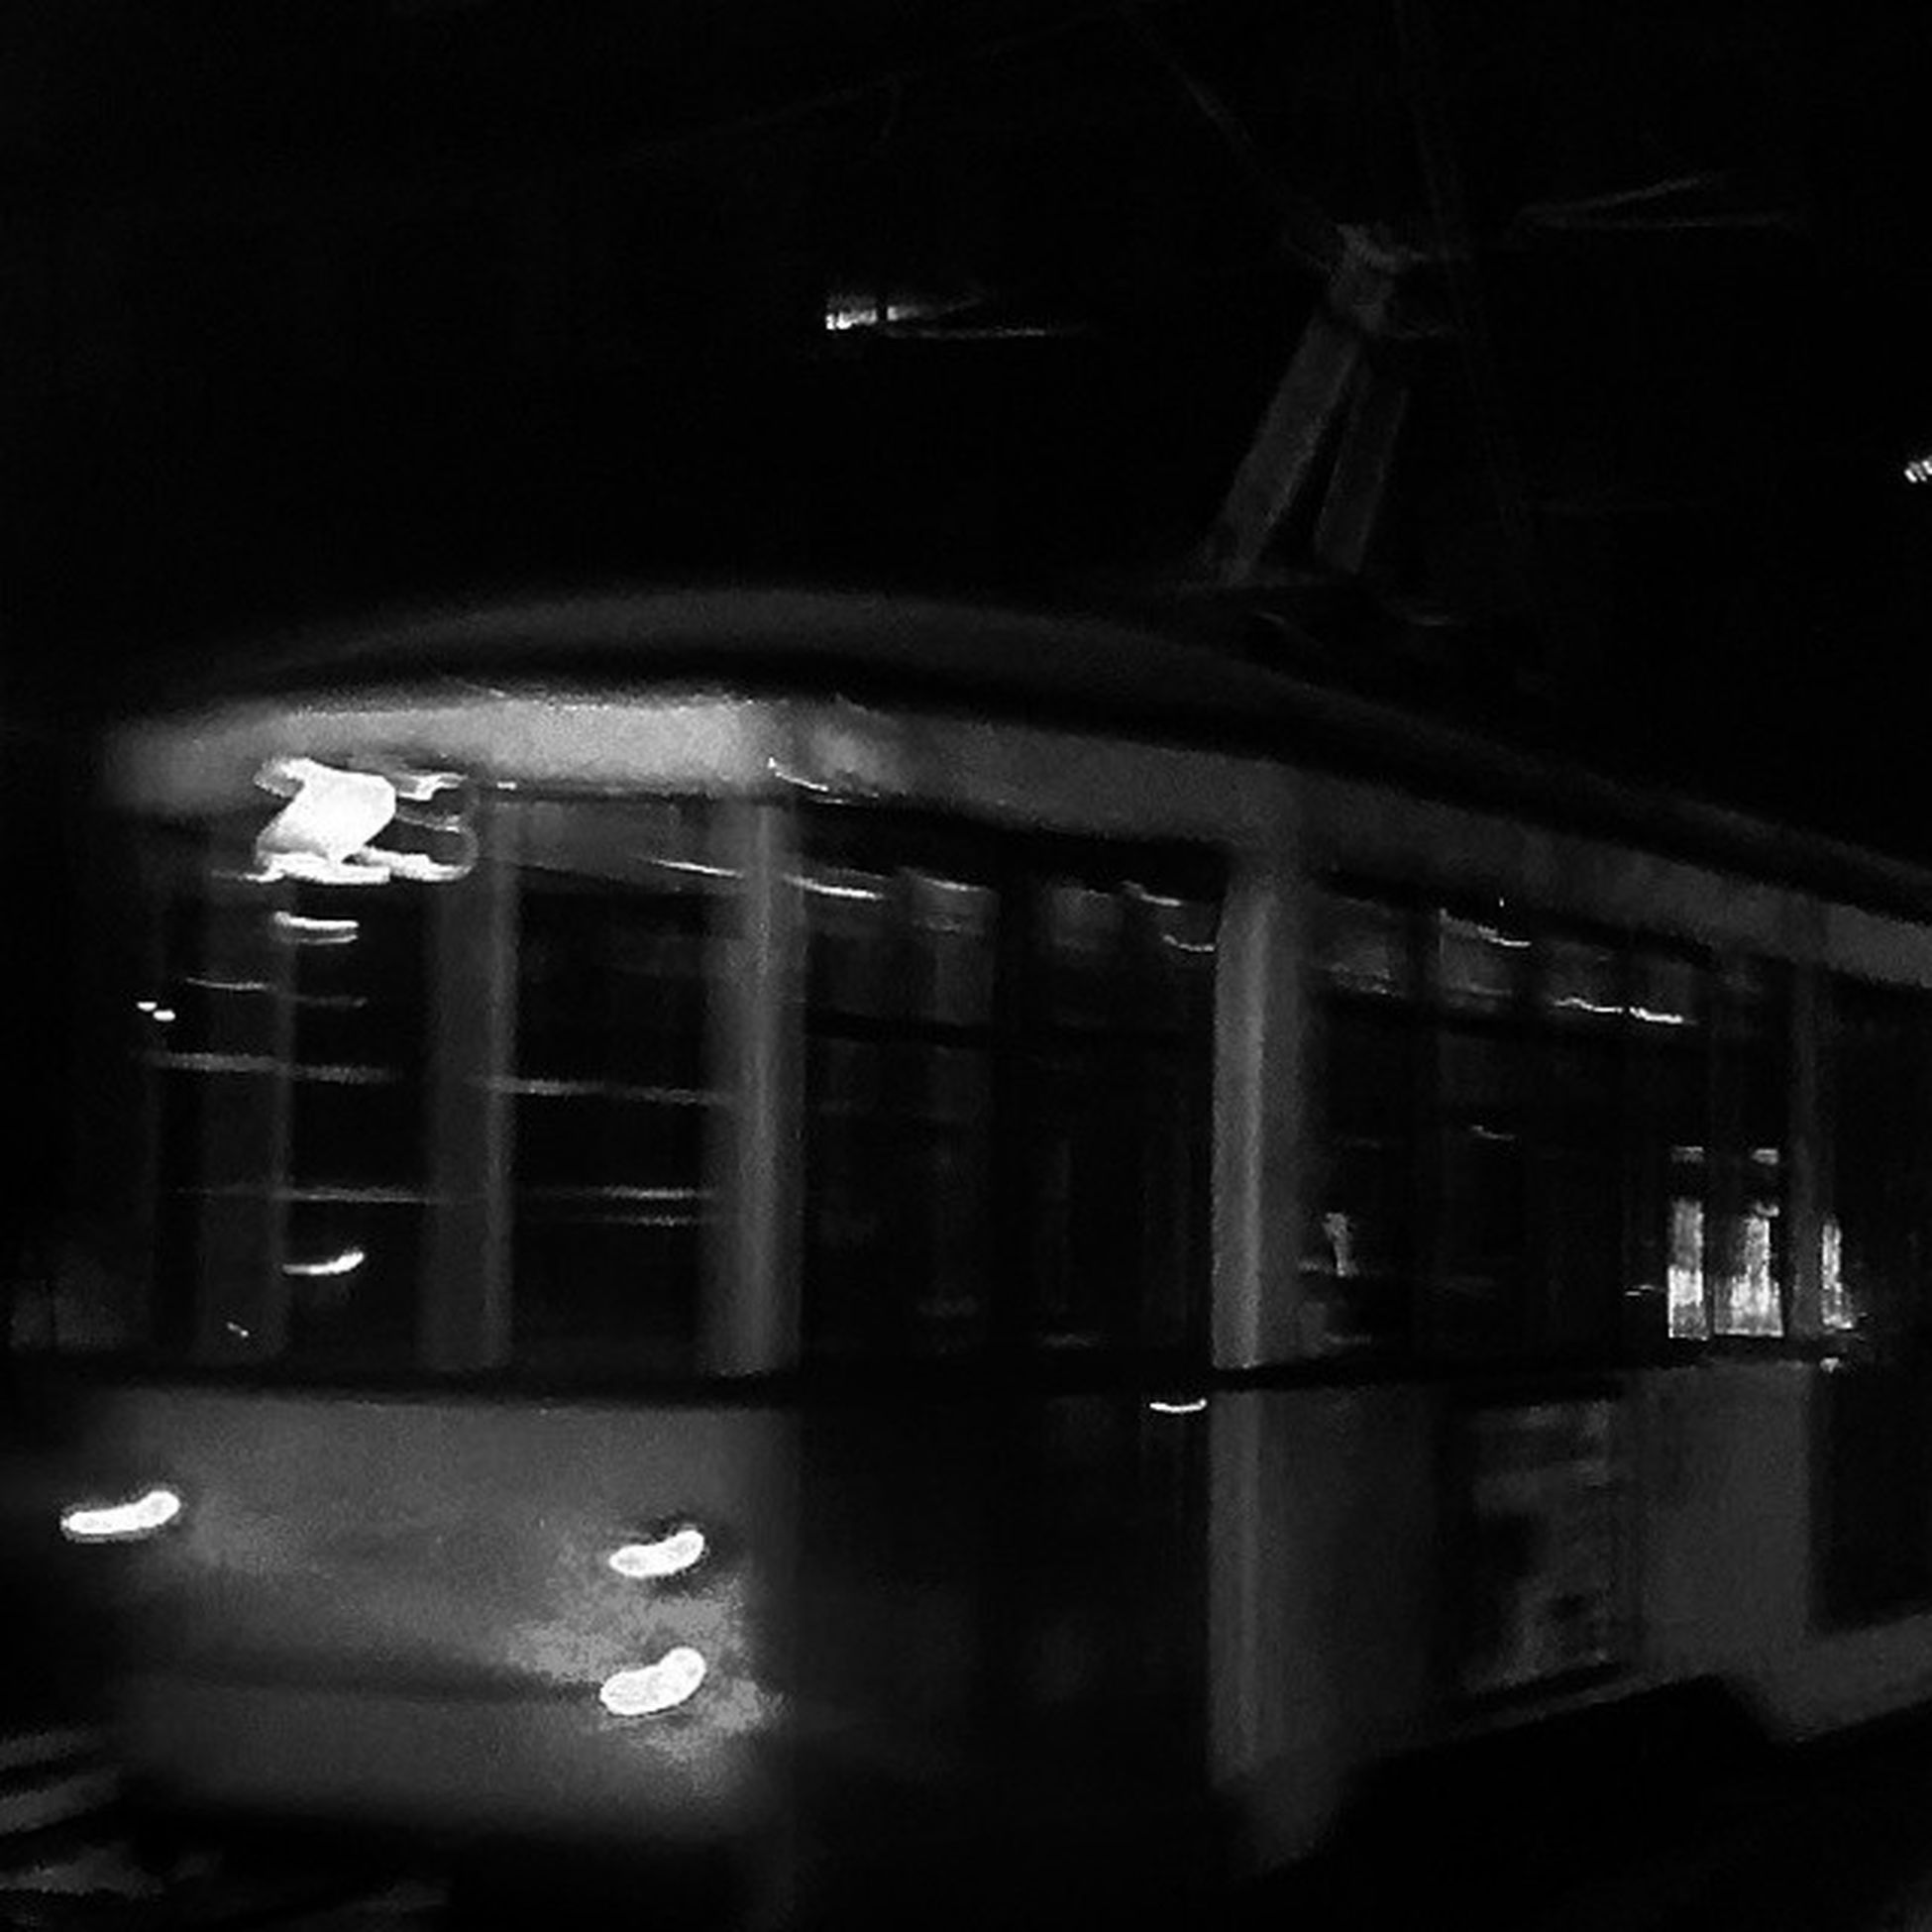 Milano by night 23 Tram Piola